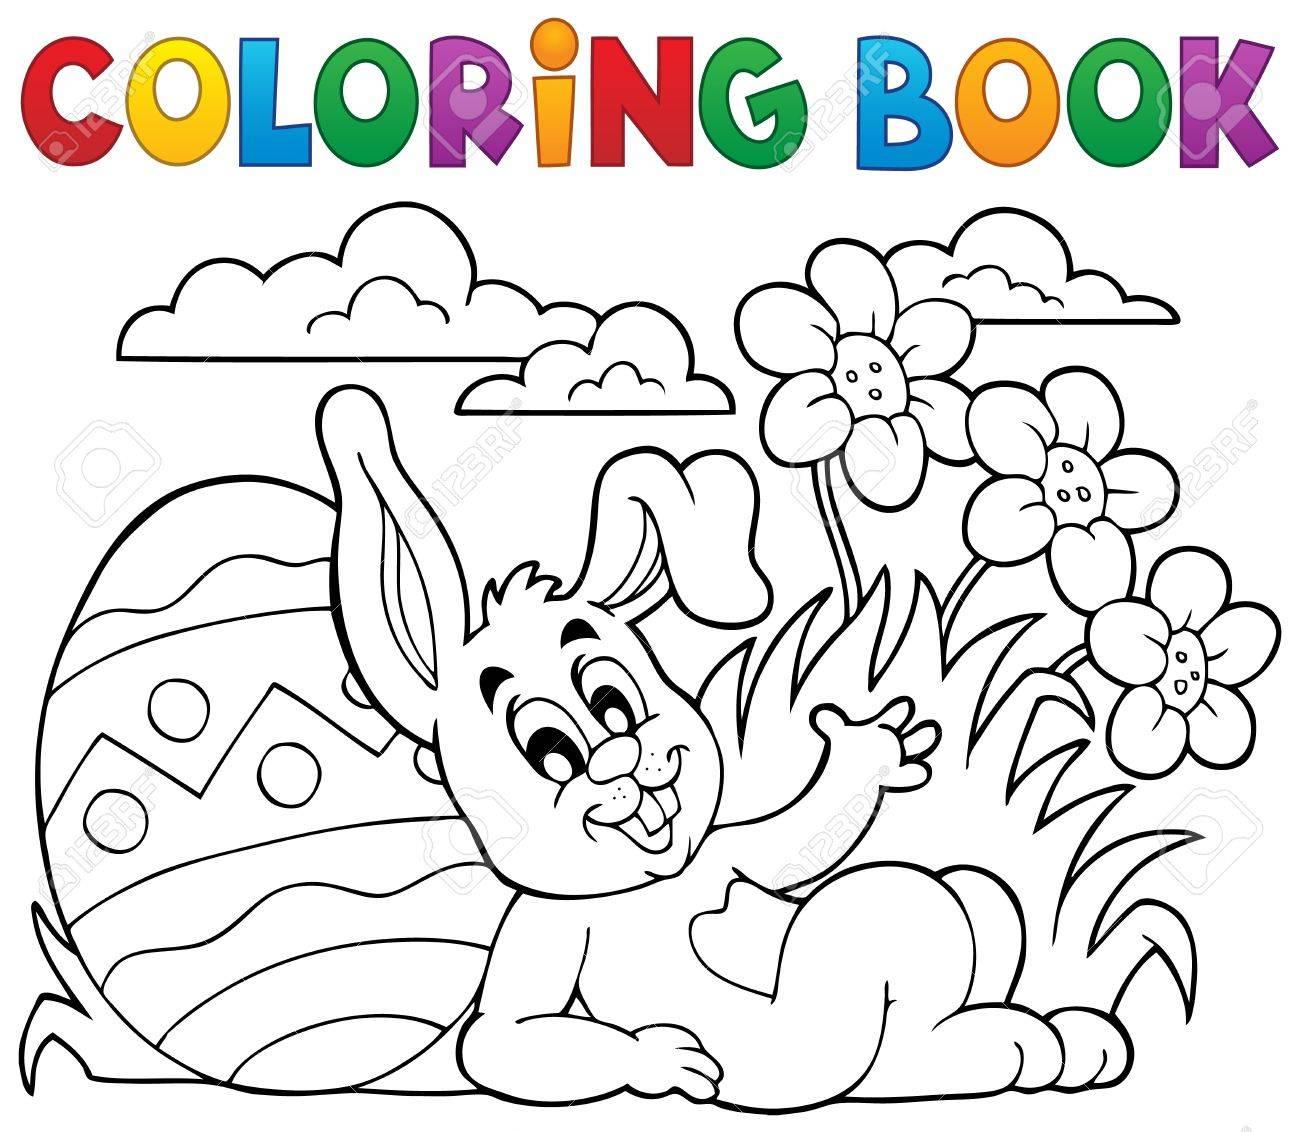 Libro Para Colorear Conejo De Pascua Tema 2 - Ilustración Vectorial ...